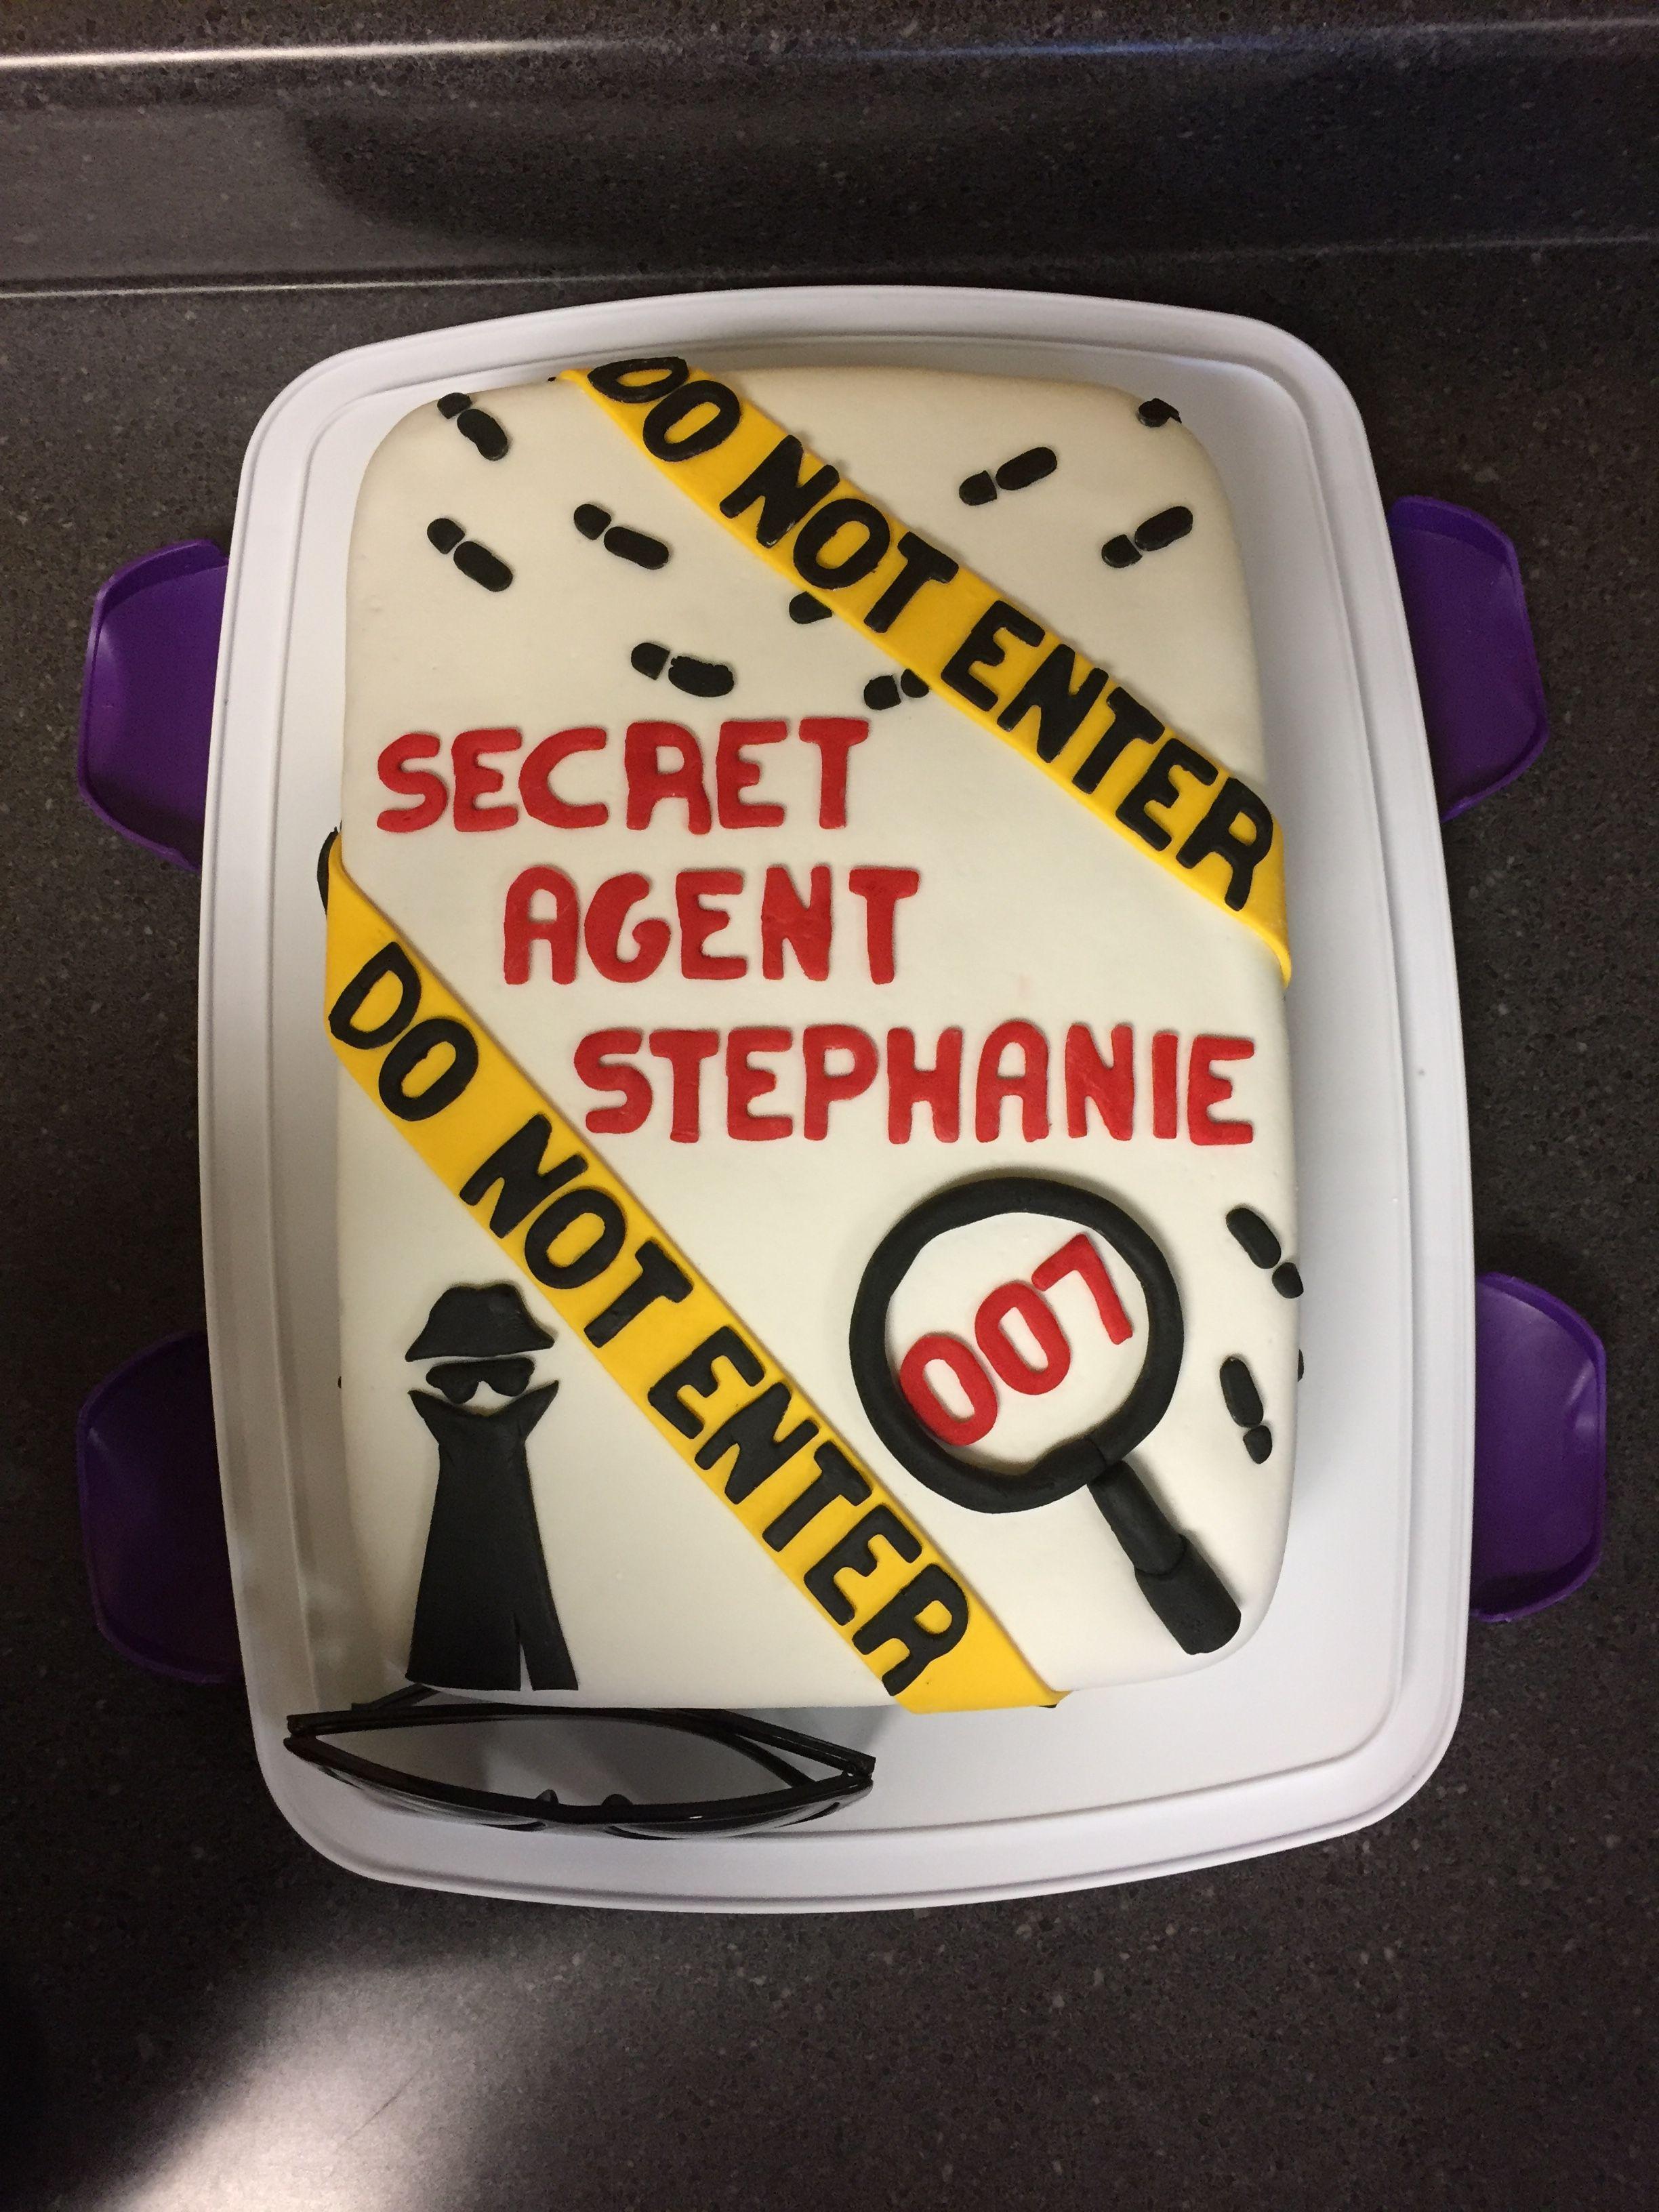 Stephanies Spy Birthday Cake Carsons First Birthday Pinterest